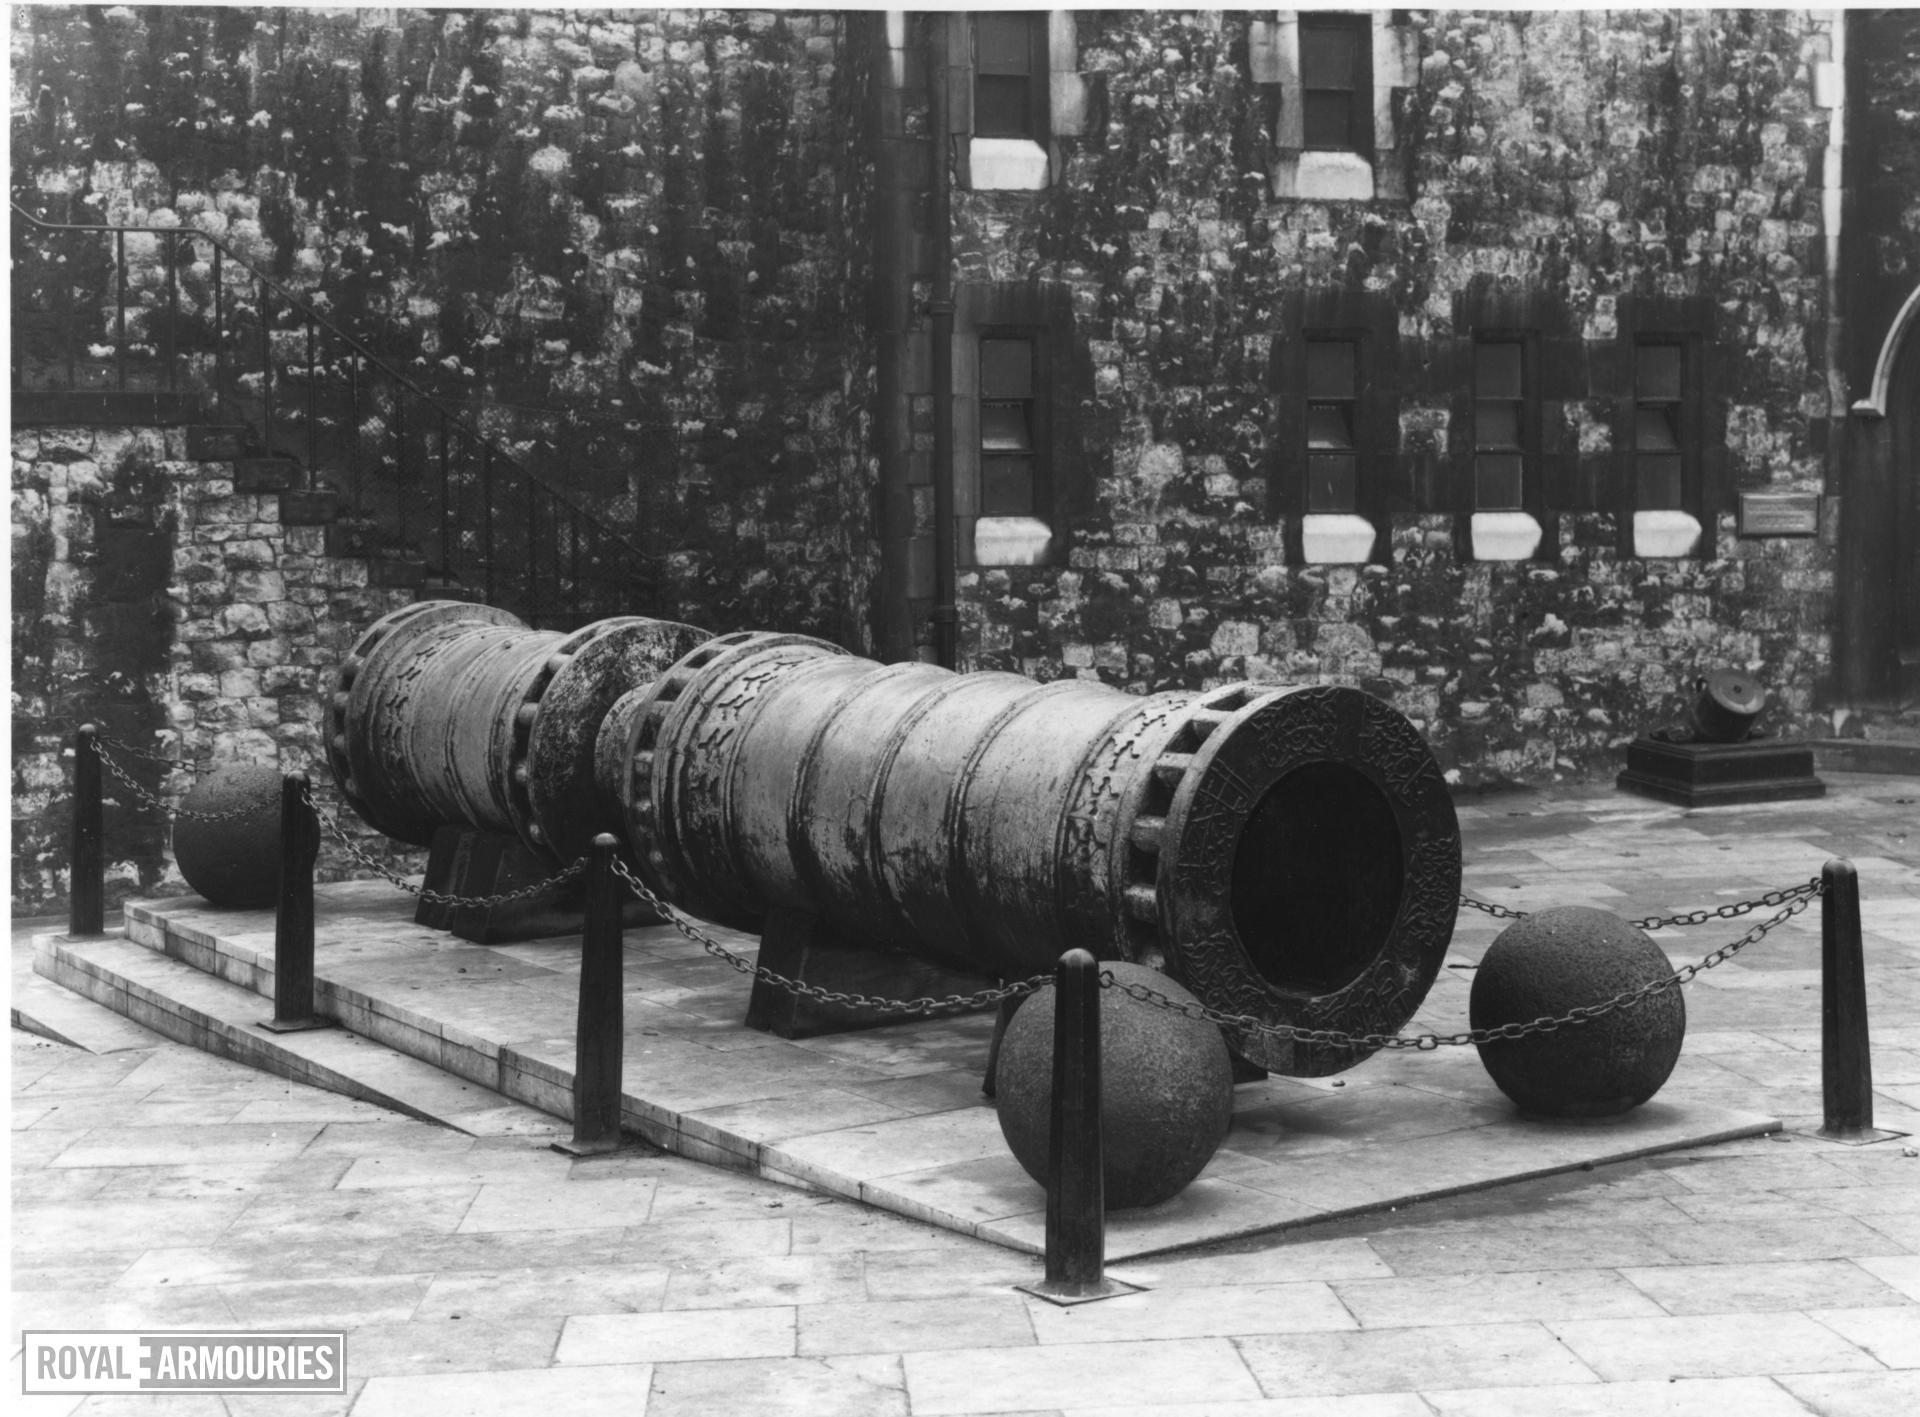 Gun - The Great Turkish Bombard Great bronze gun also known as the 'Dardanelles gun'.